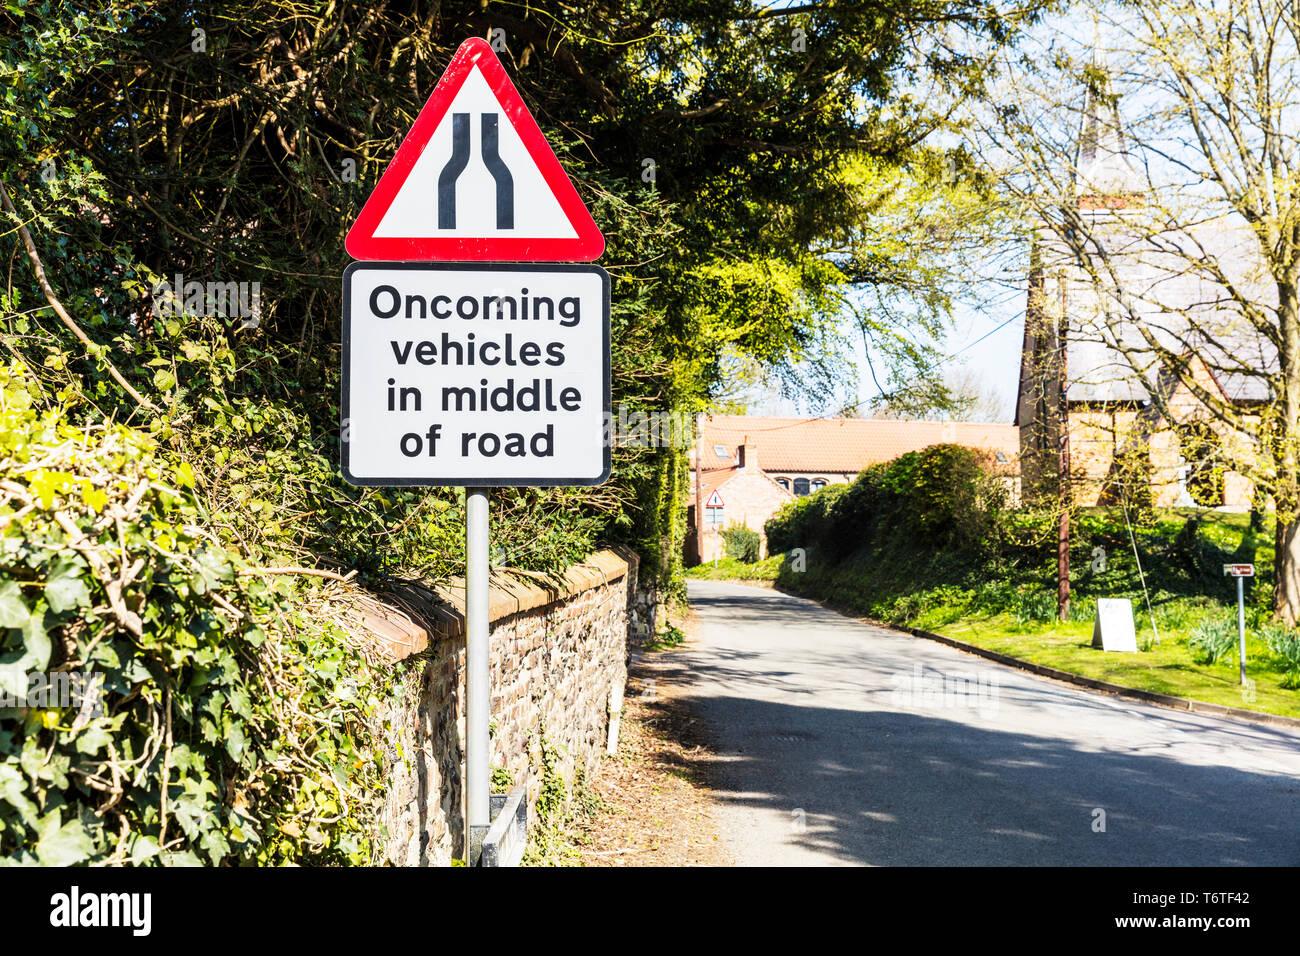 Oncoming vehicles road sign, Oncoming vehicles in middle of road sign, UK road sign, UK road signs, warning, sign, signs, UK, road narrows sign, - Stock Image